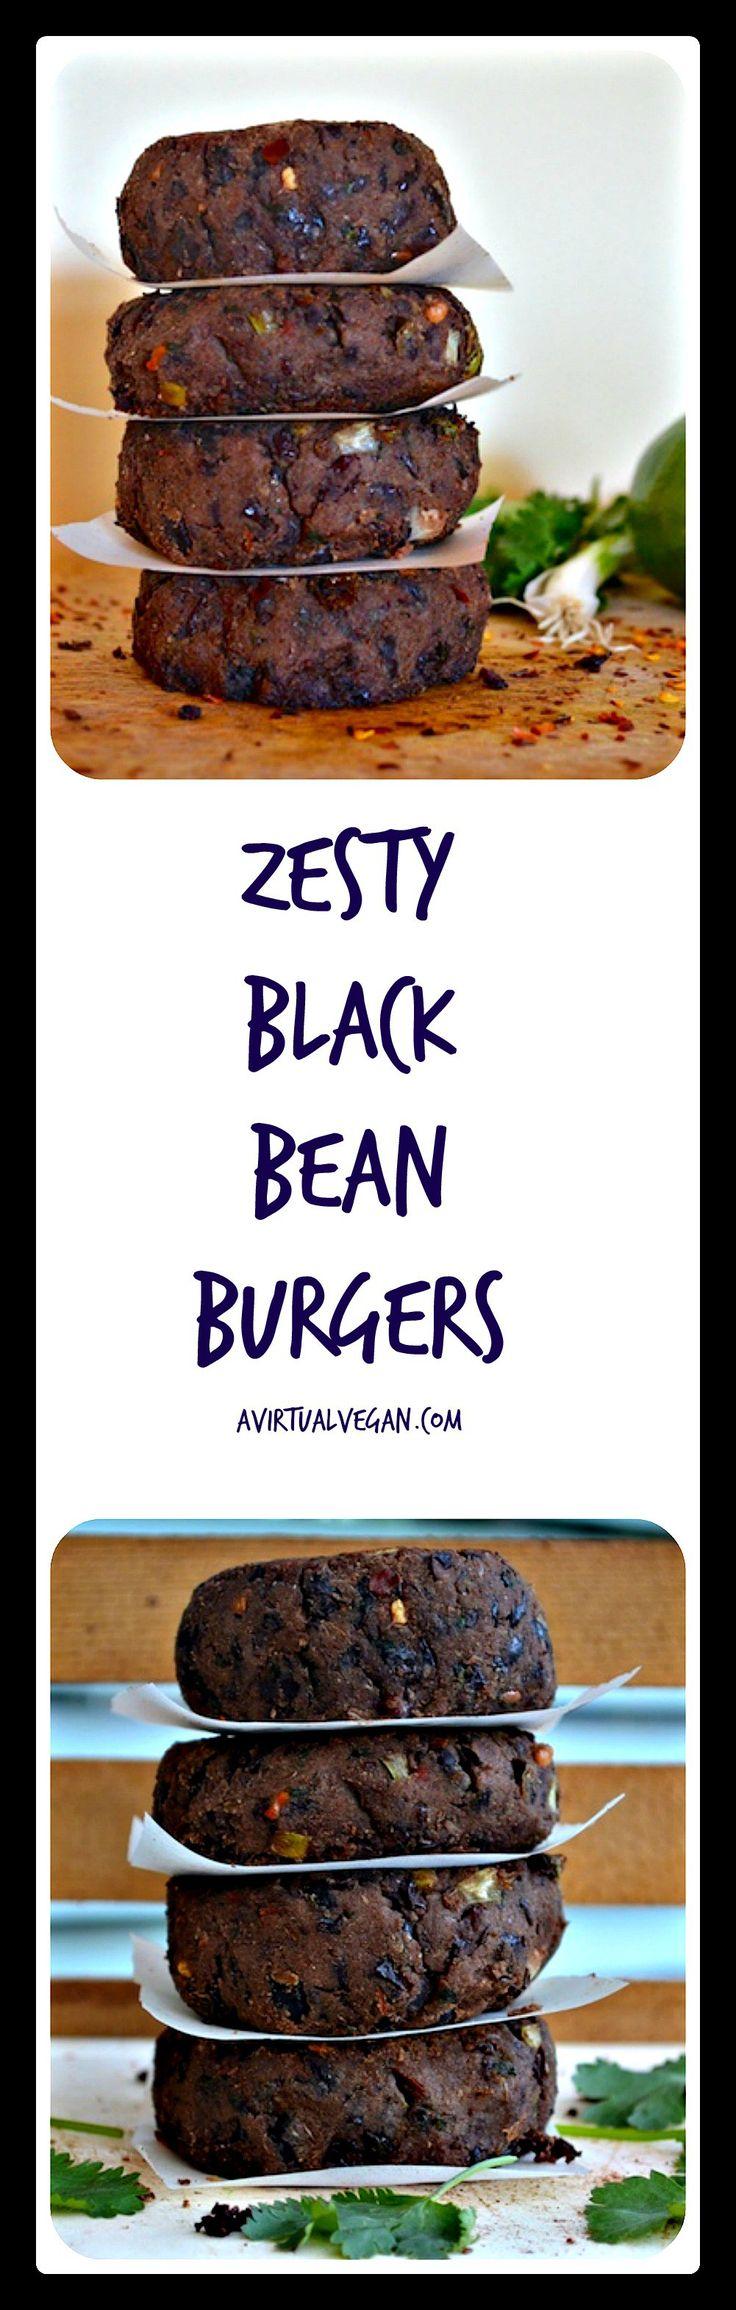 zesty black bean burgers